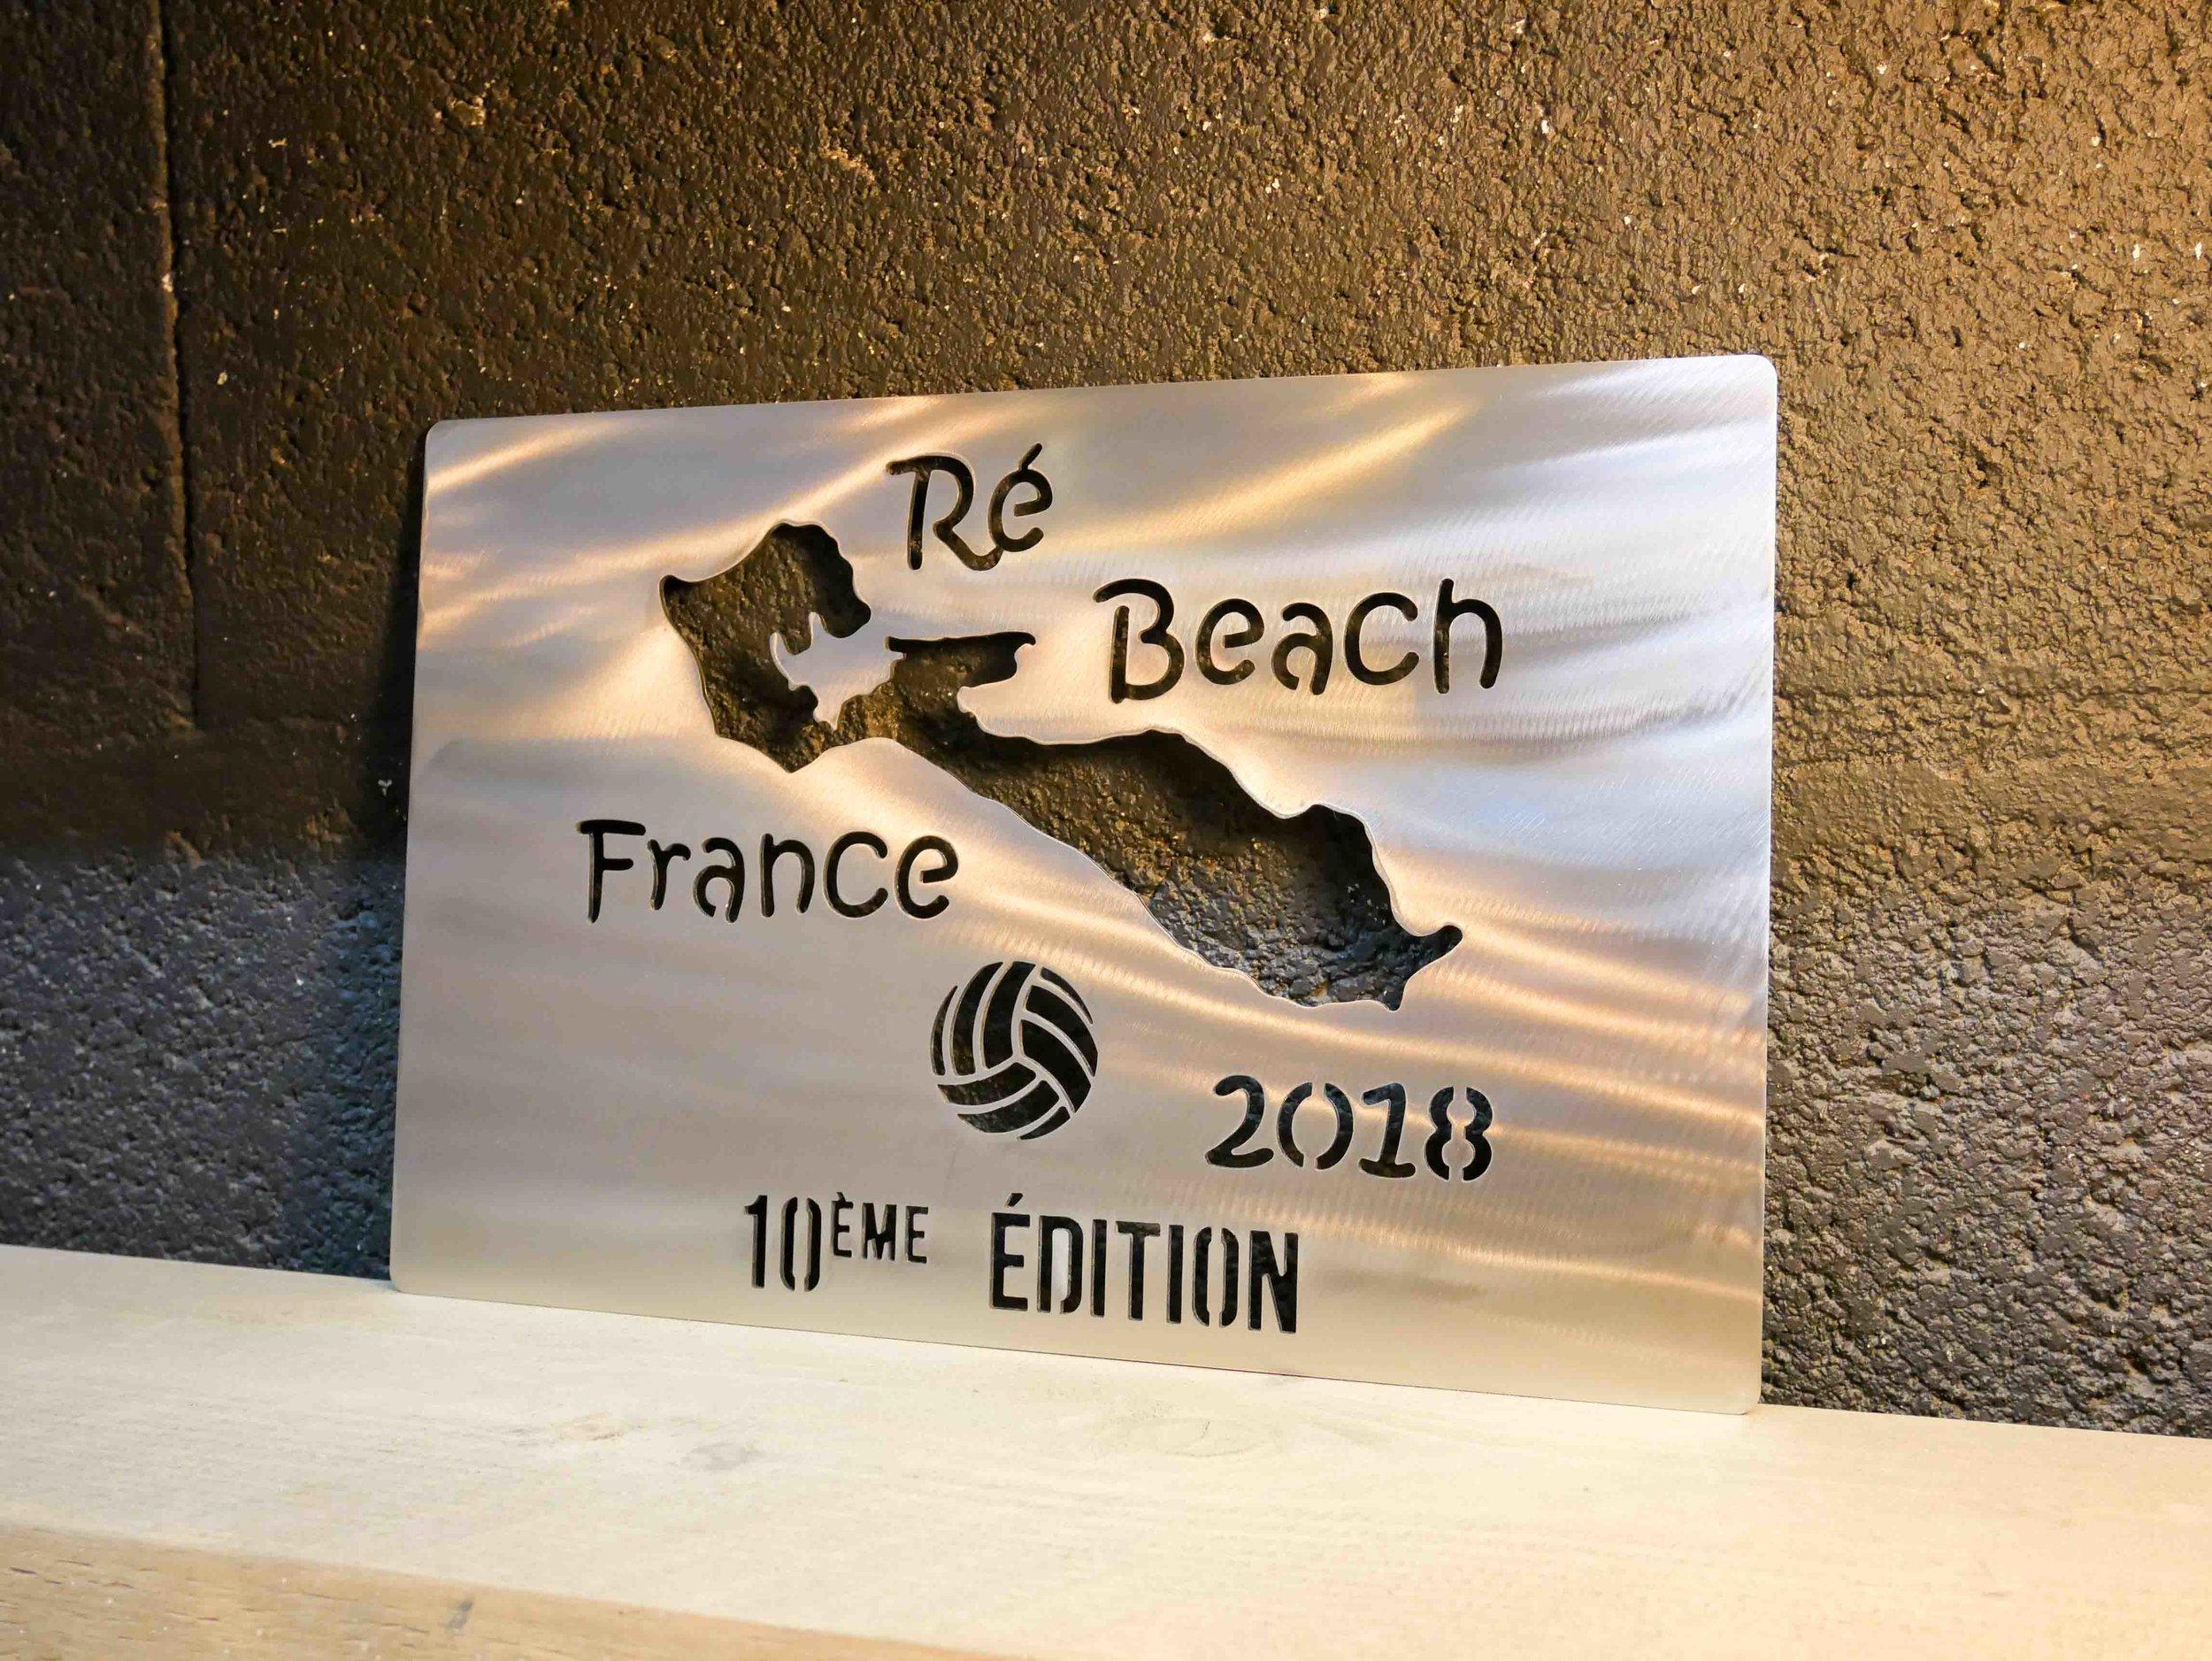 Trophée_RéBeachFrance_2018_V1.jpg